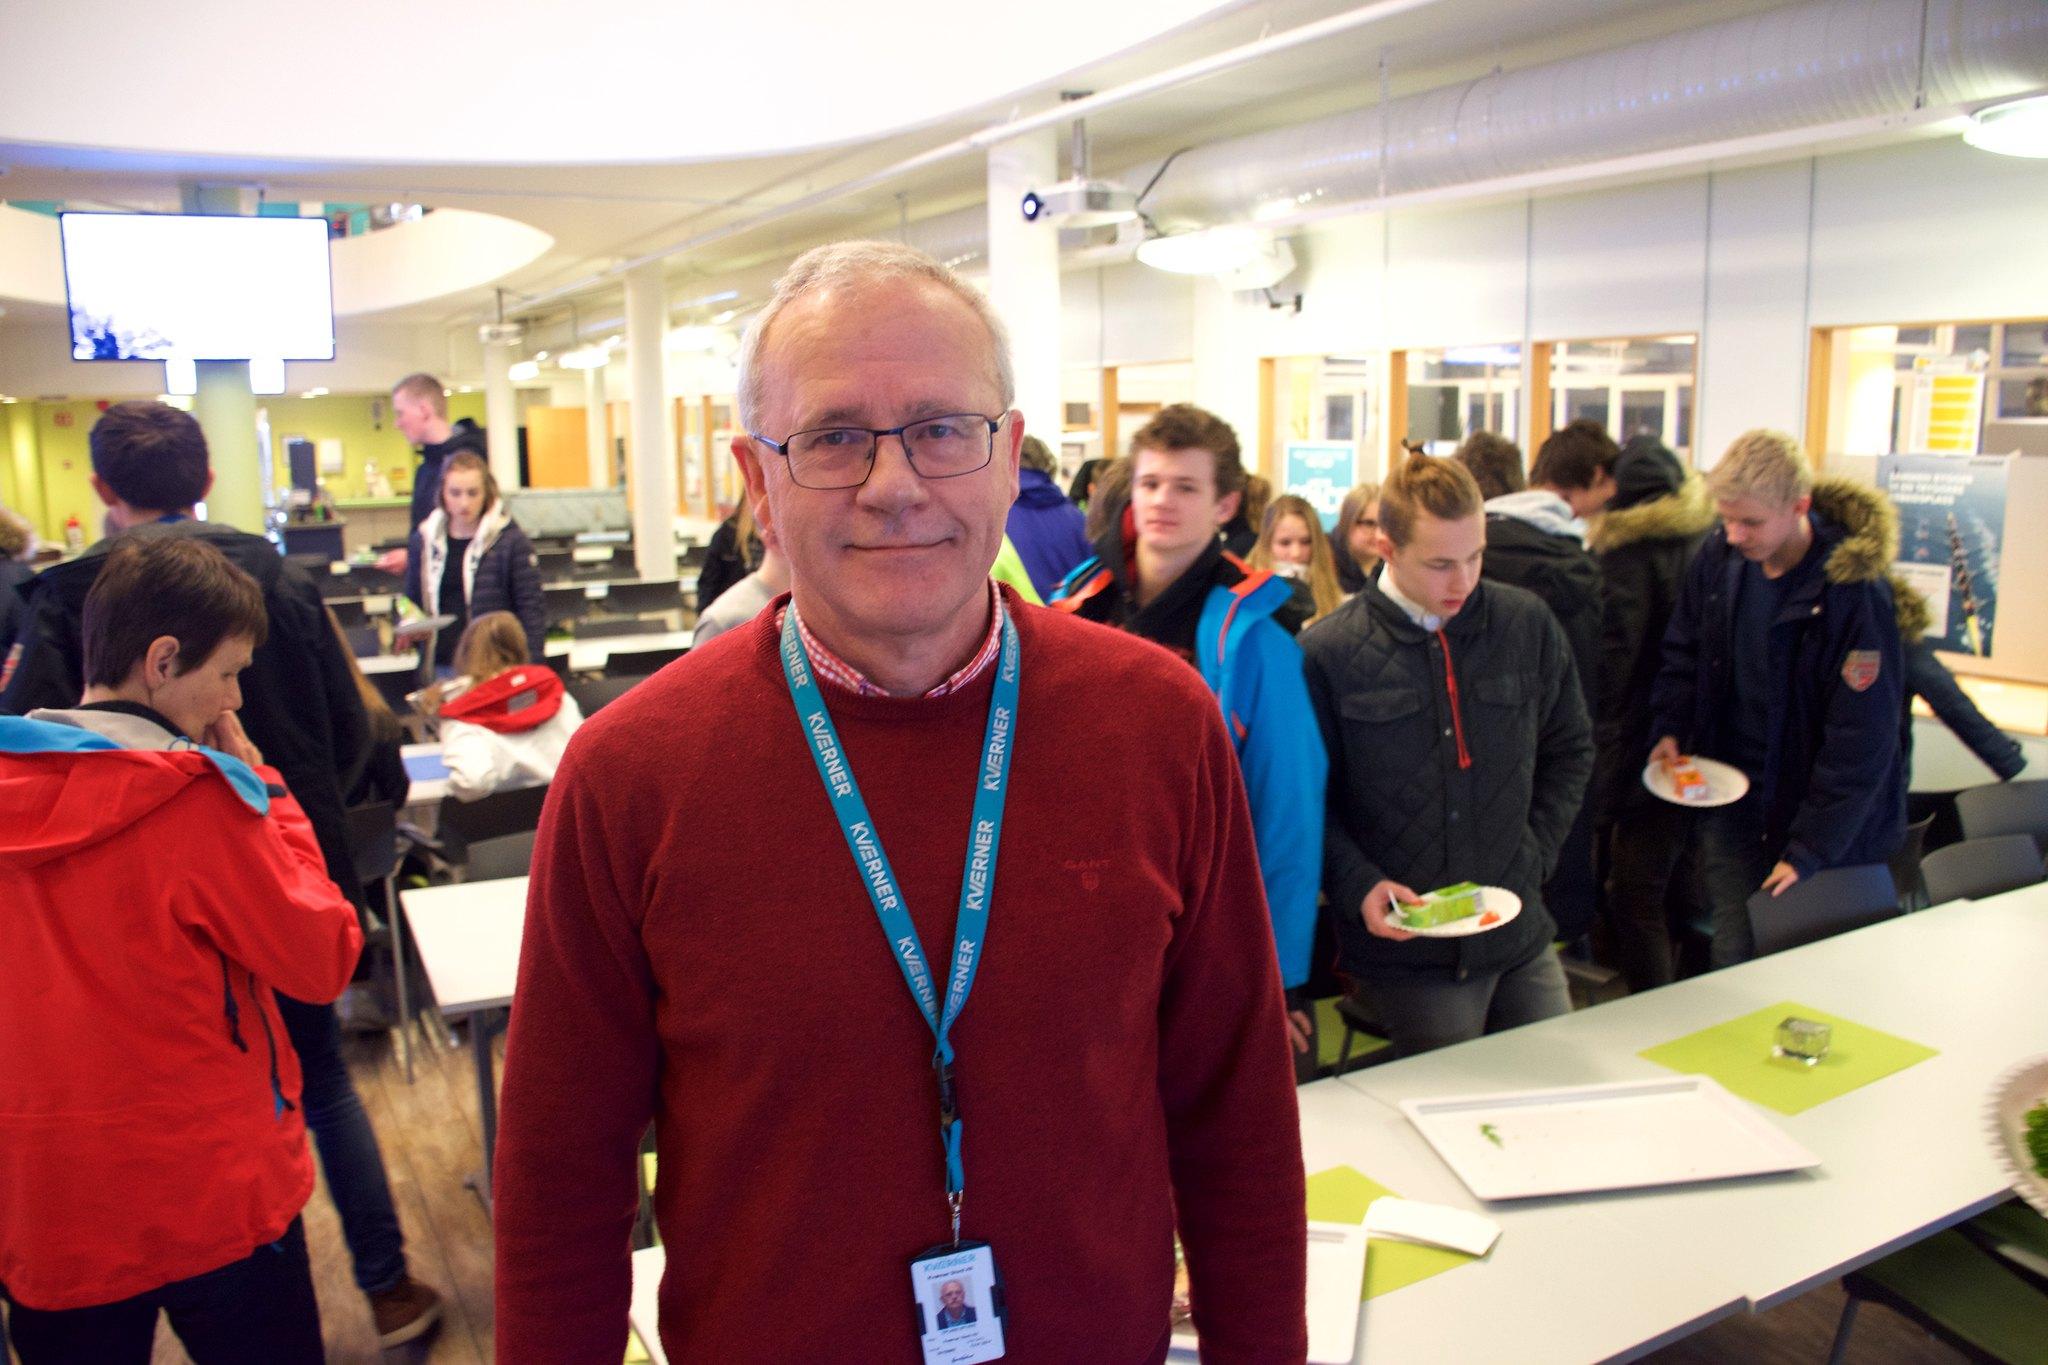 Øyvind Epland